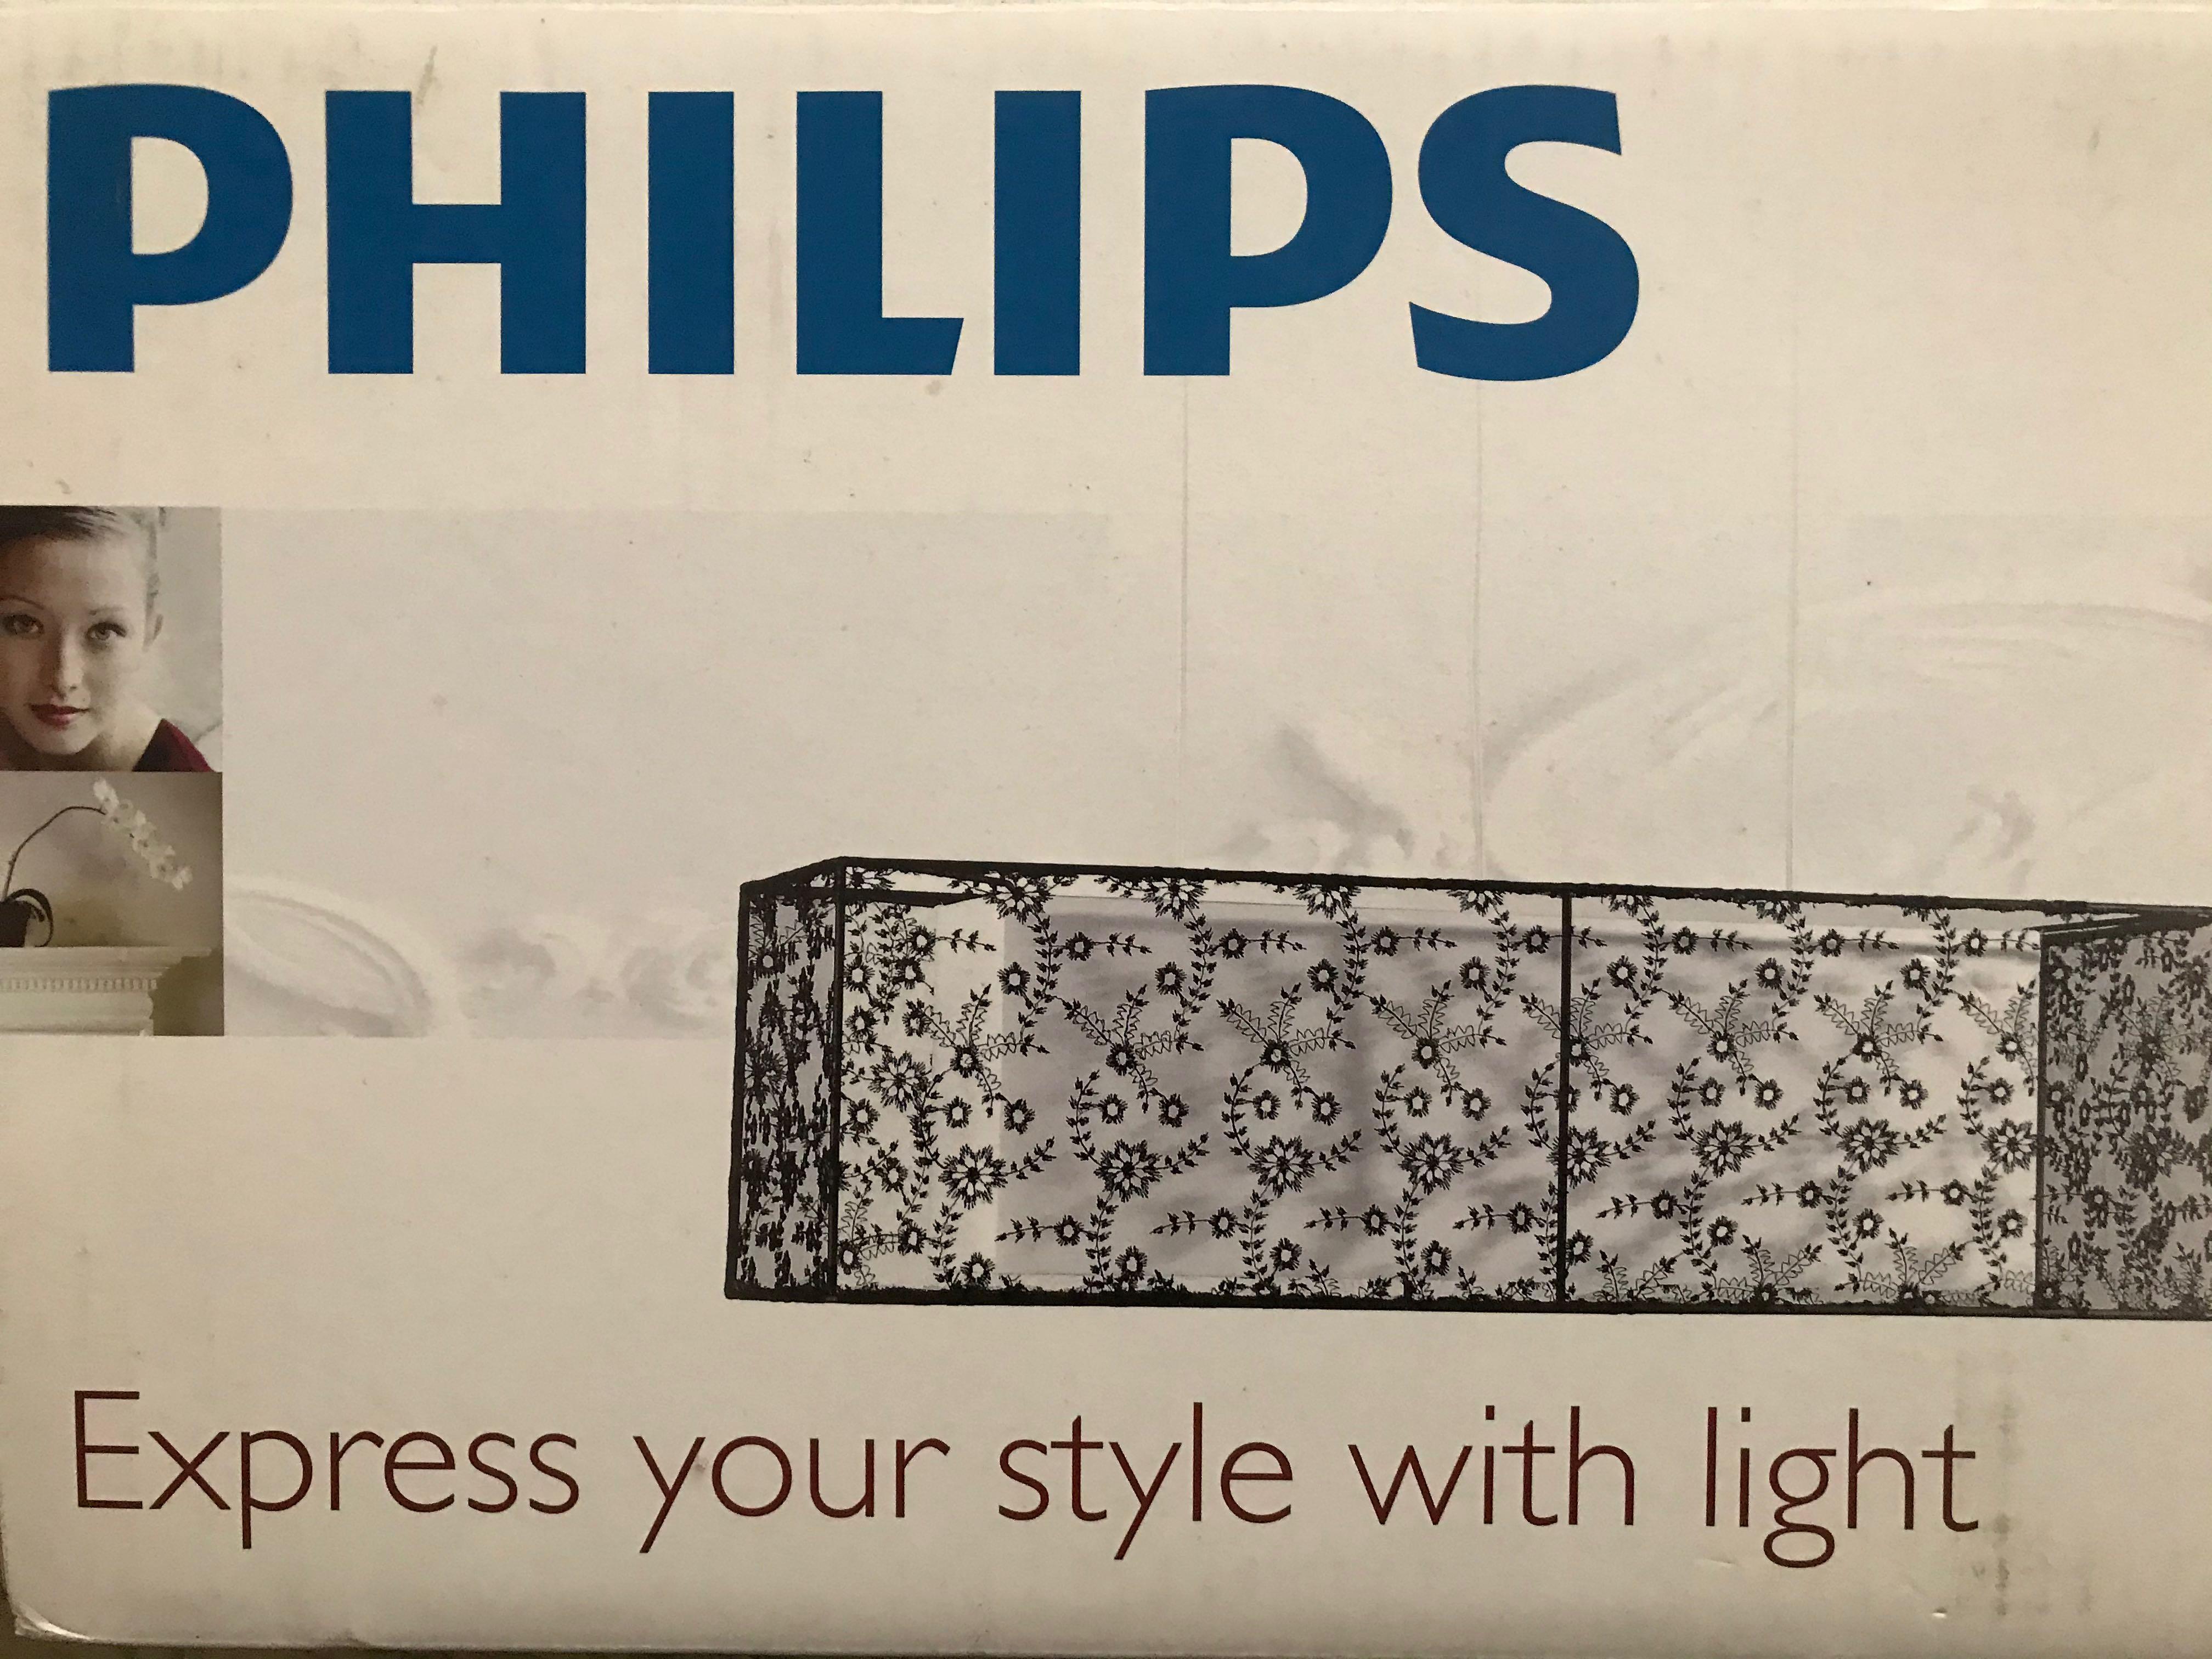 Philips 飛利浦吊燈 -古典風格~QPG321~黑色~飛利浦餐吊燈